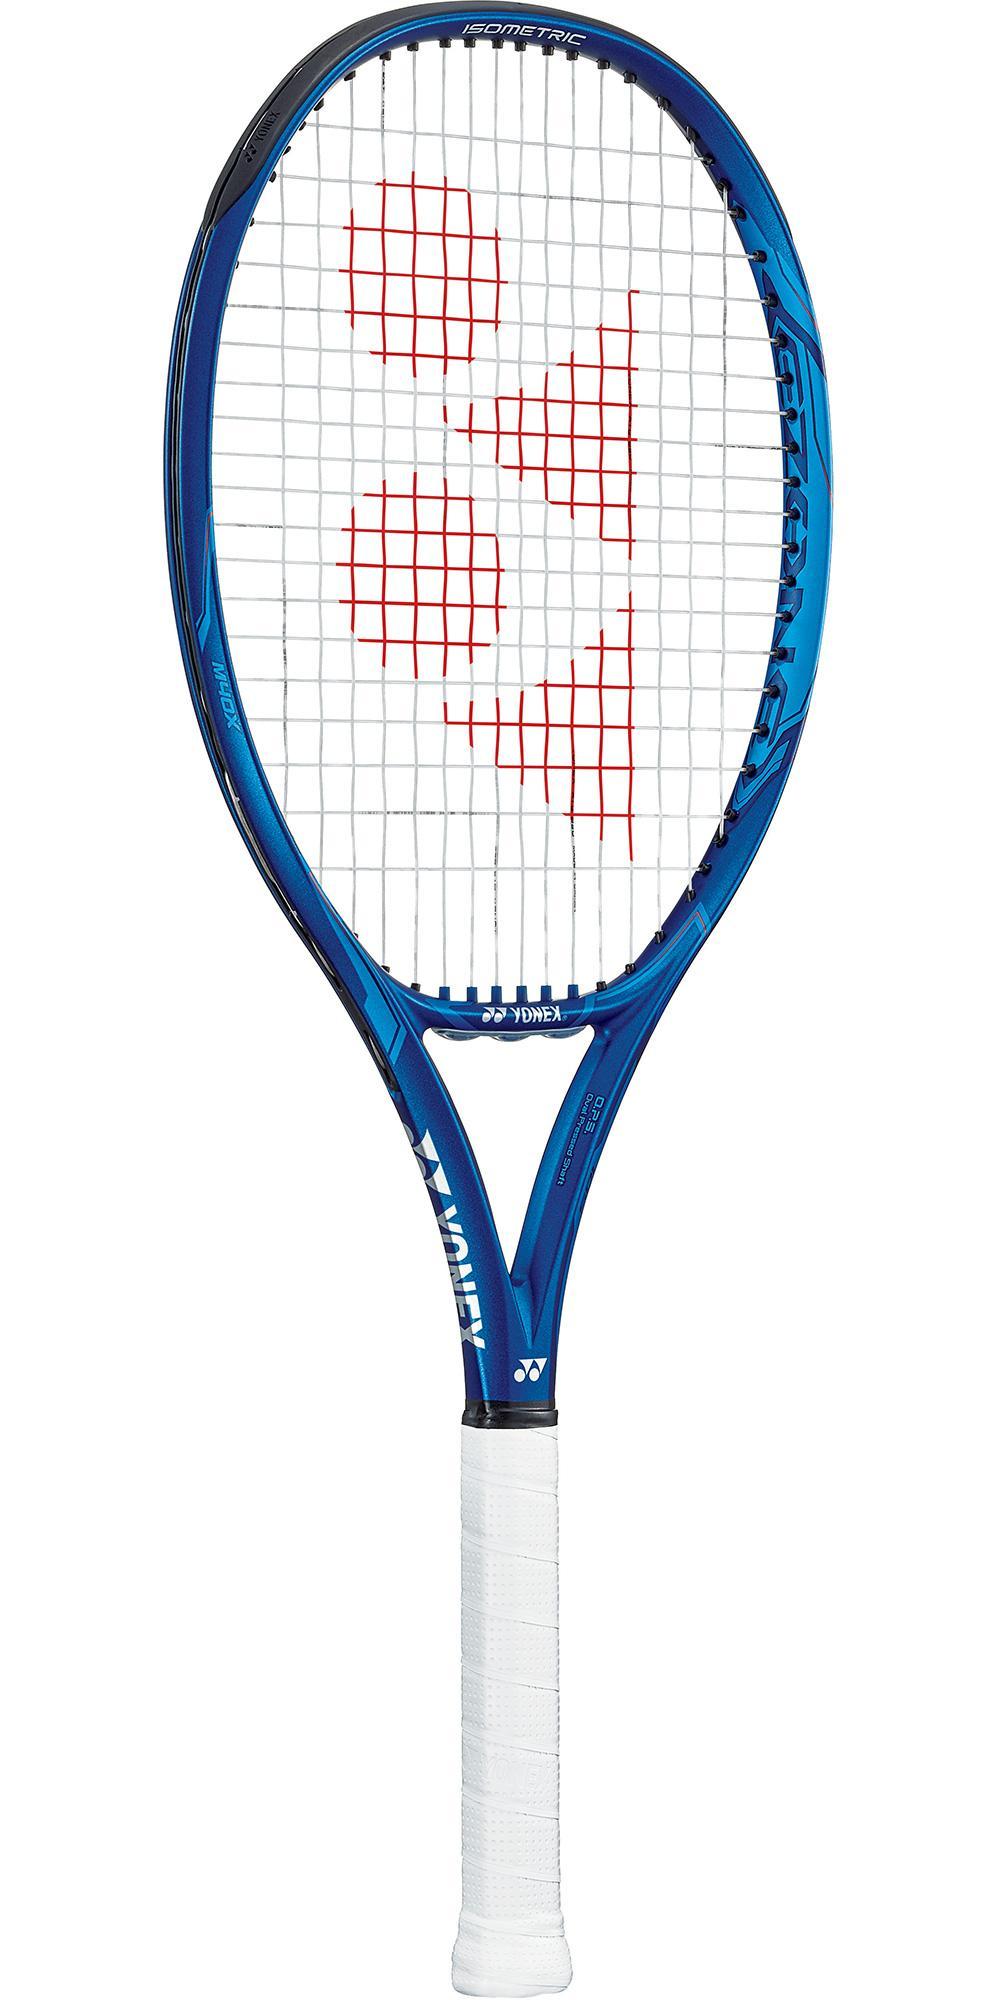 Raquete de Tênis Yonex EZONE 105